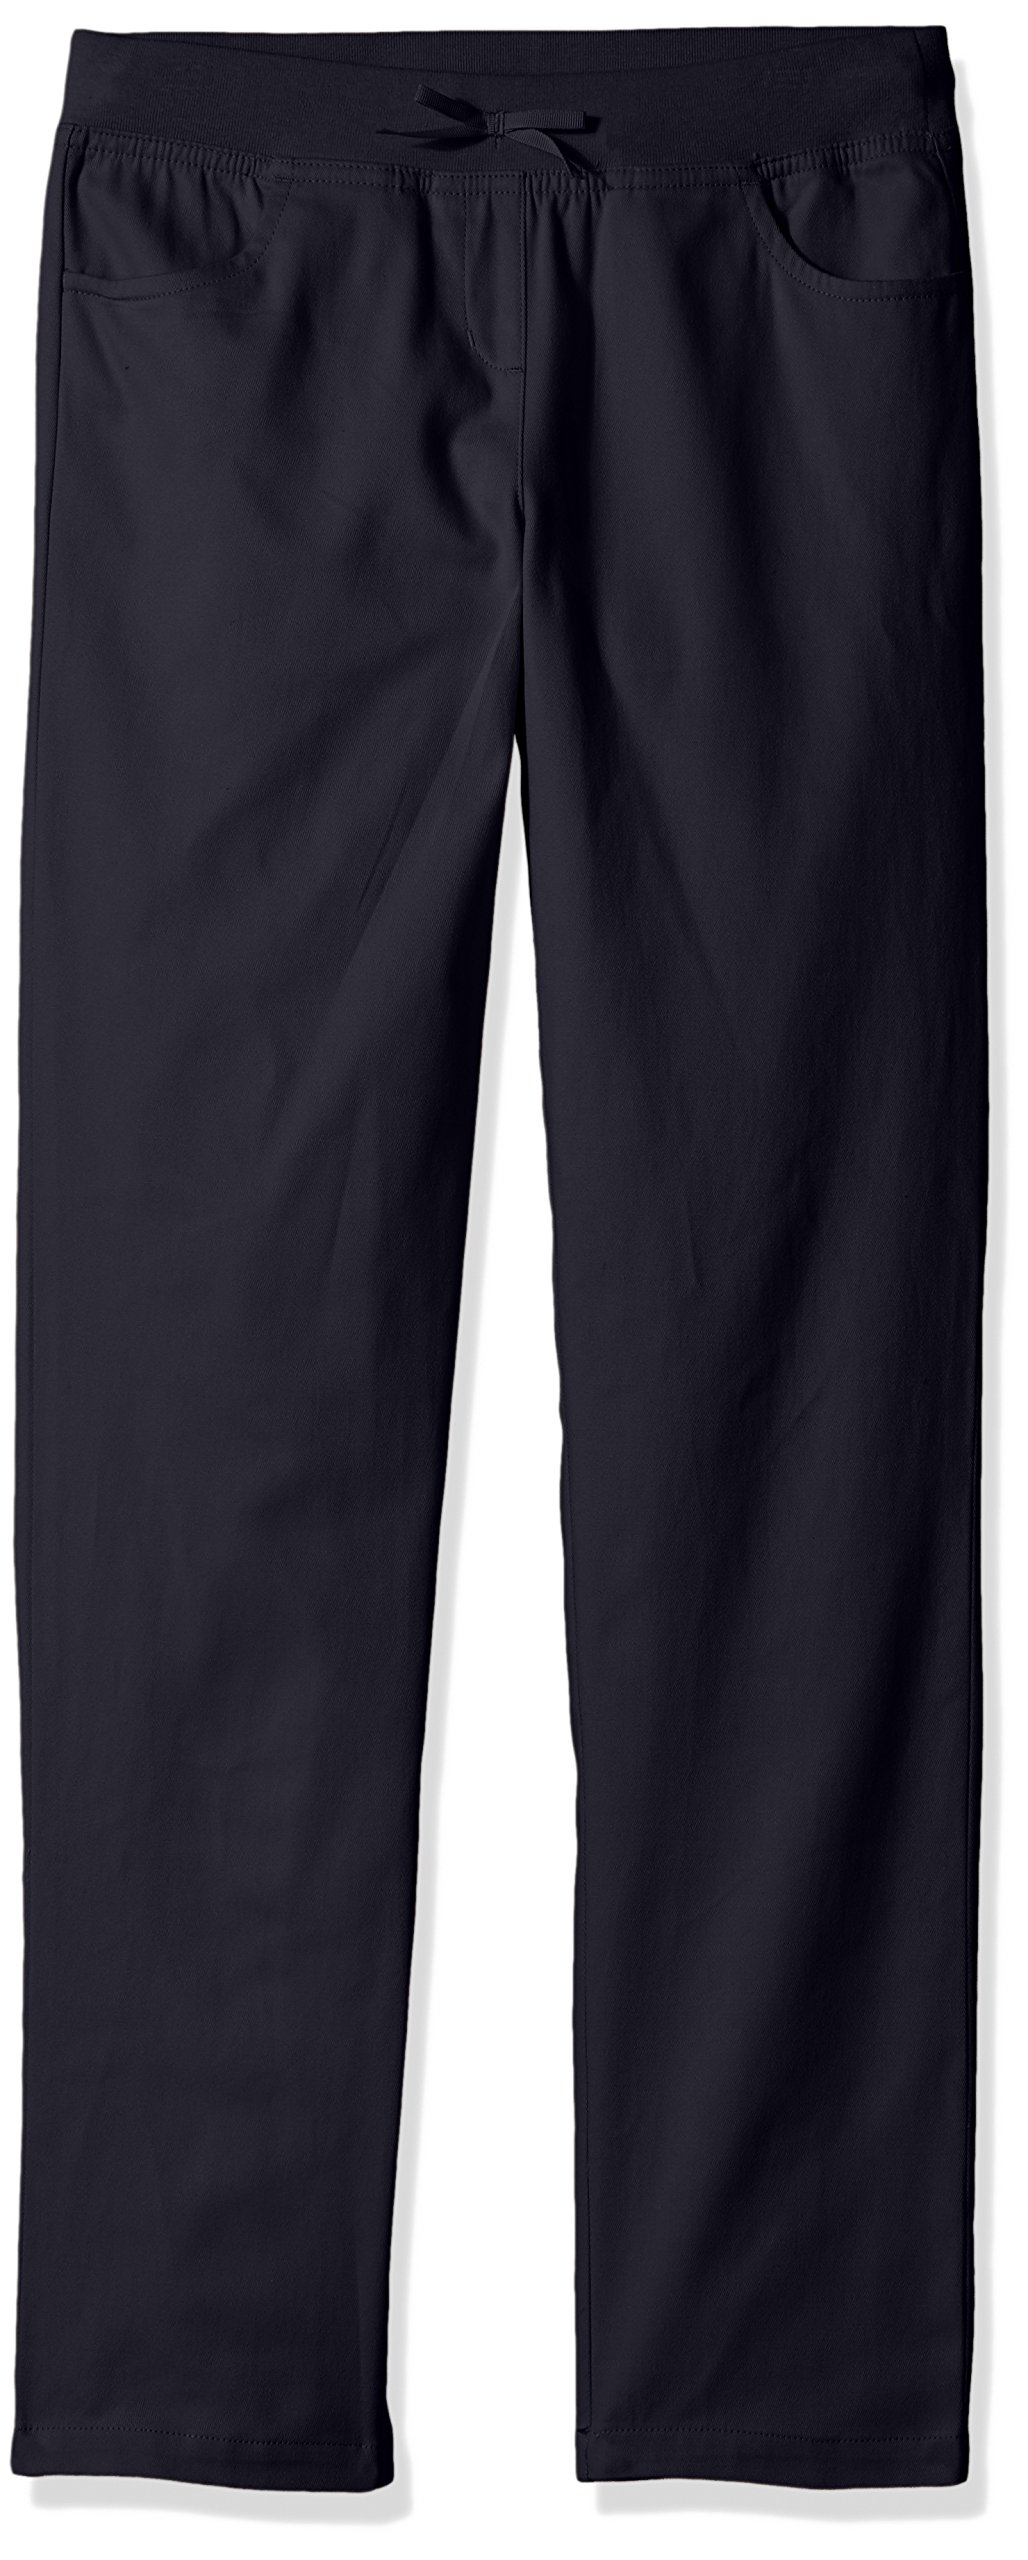 Dockers Little Girls' Uniform Skinny Pant with Rib Waistband, Navy, 5